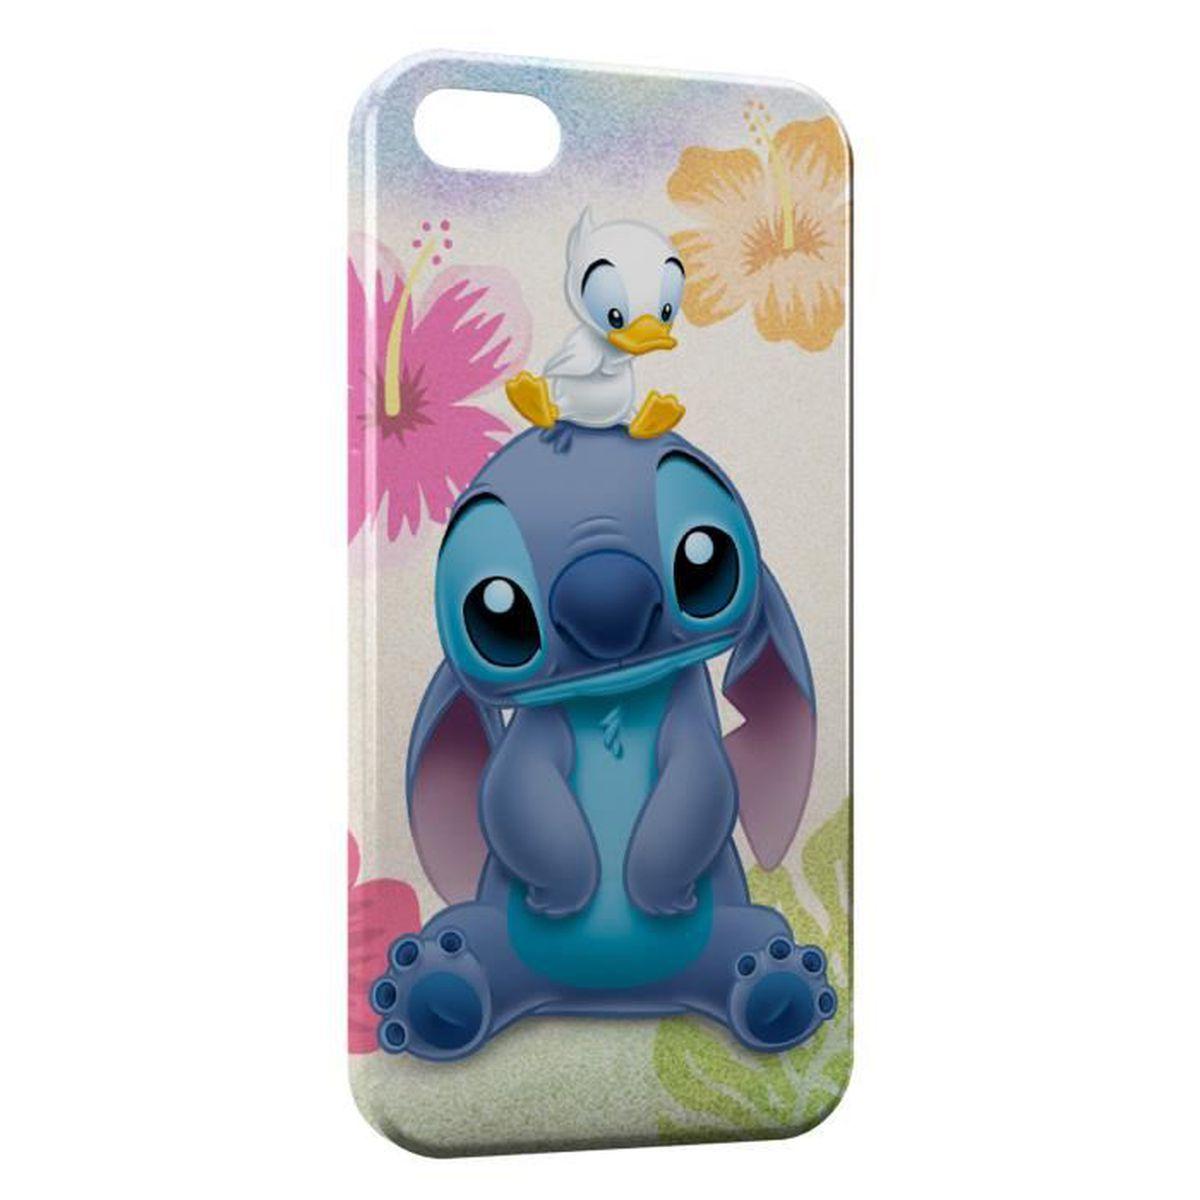 Coque iPhone 5 & 5S Stitch Canard - Cdiscount Téléphonie